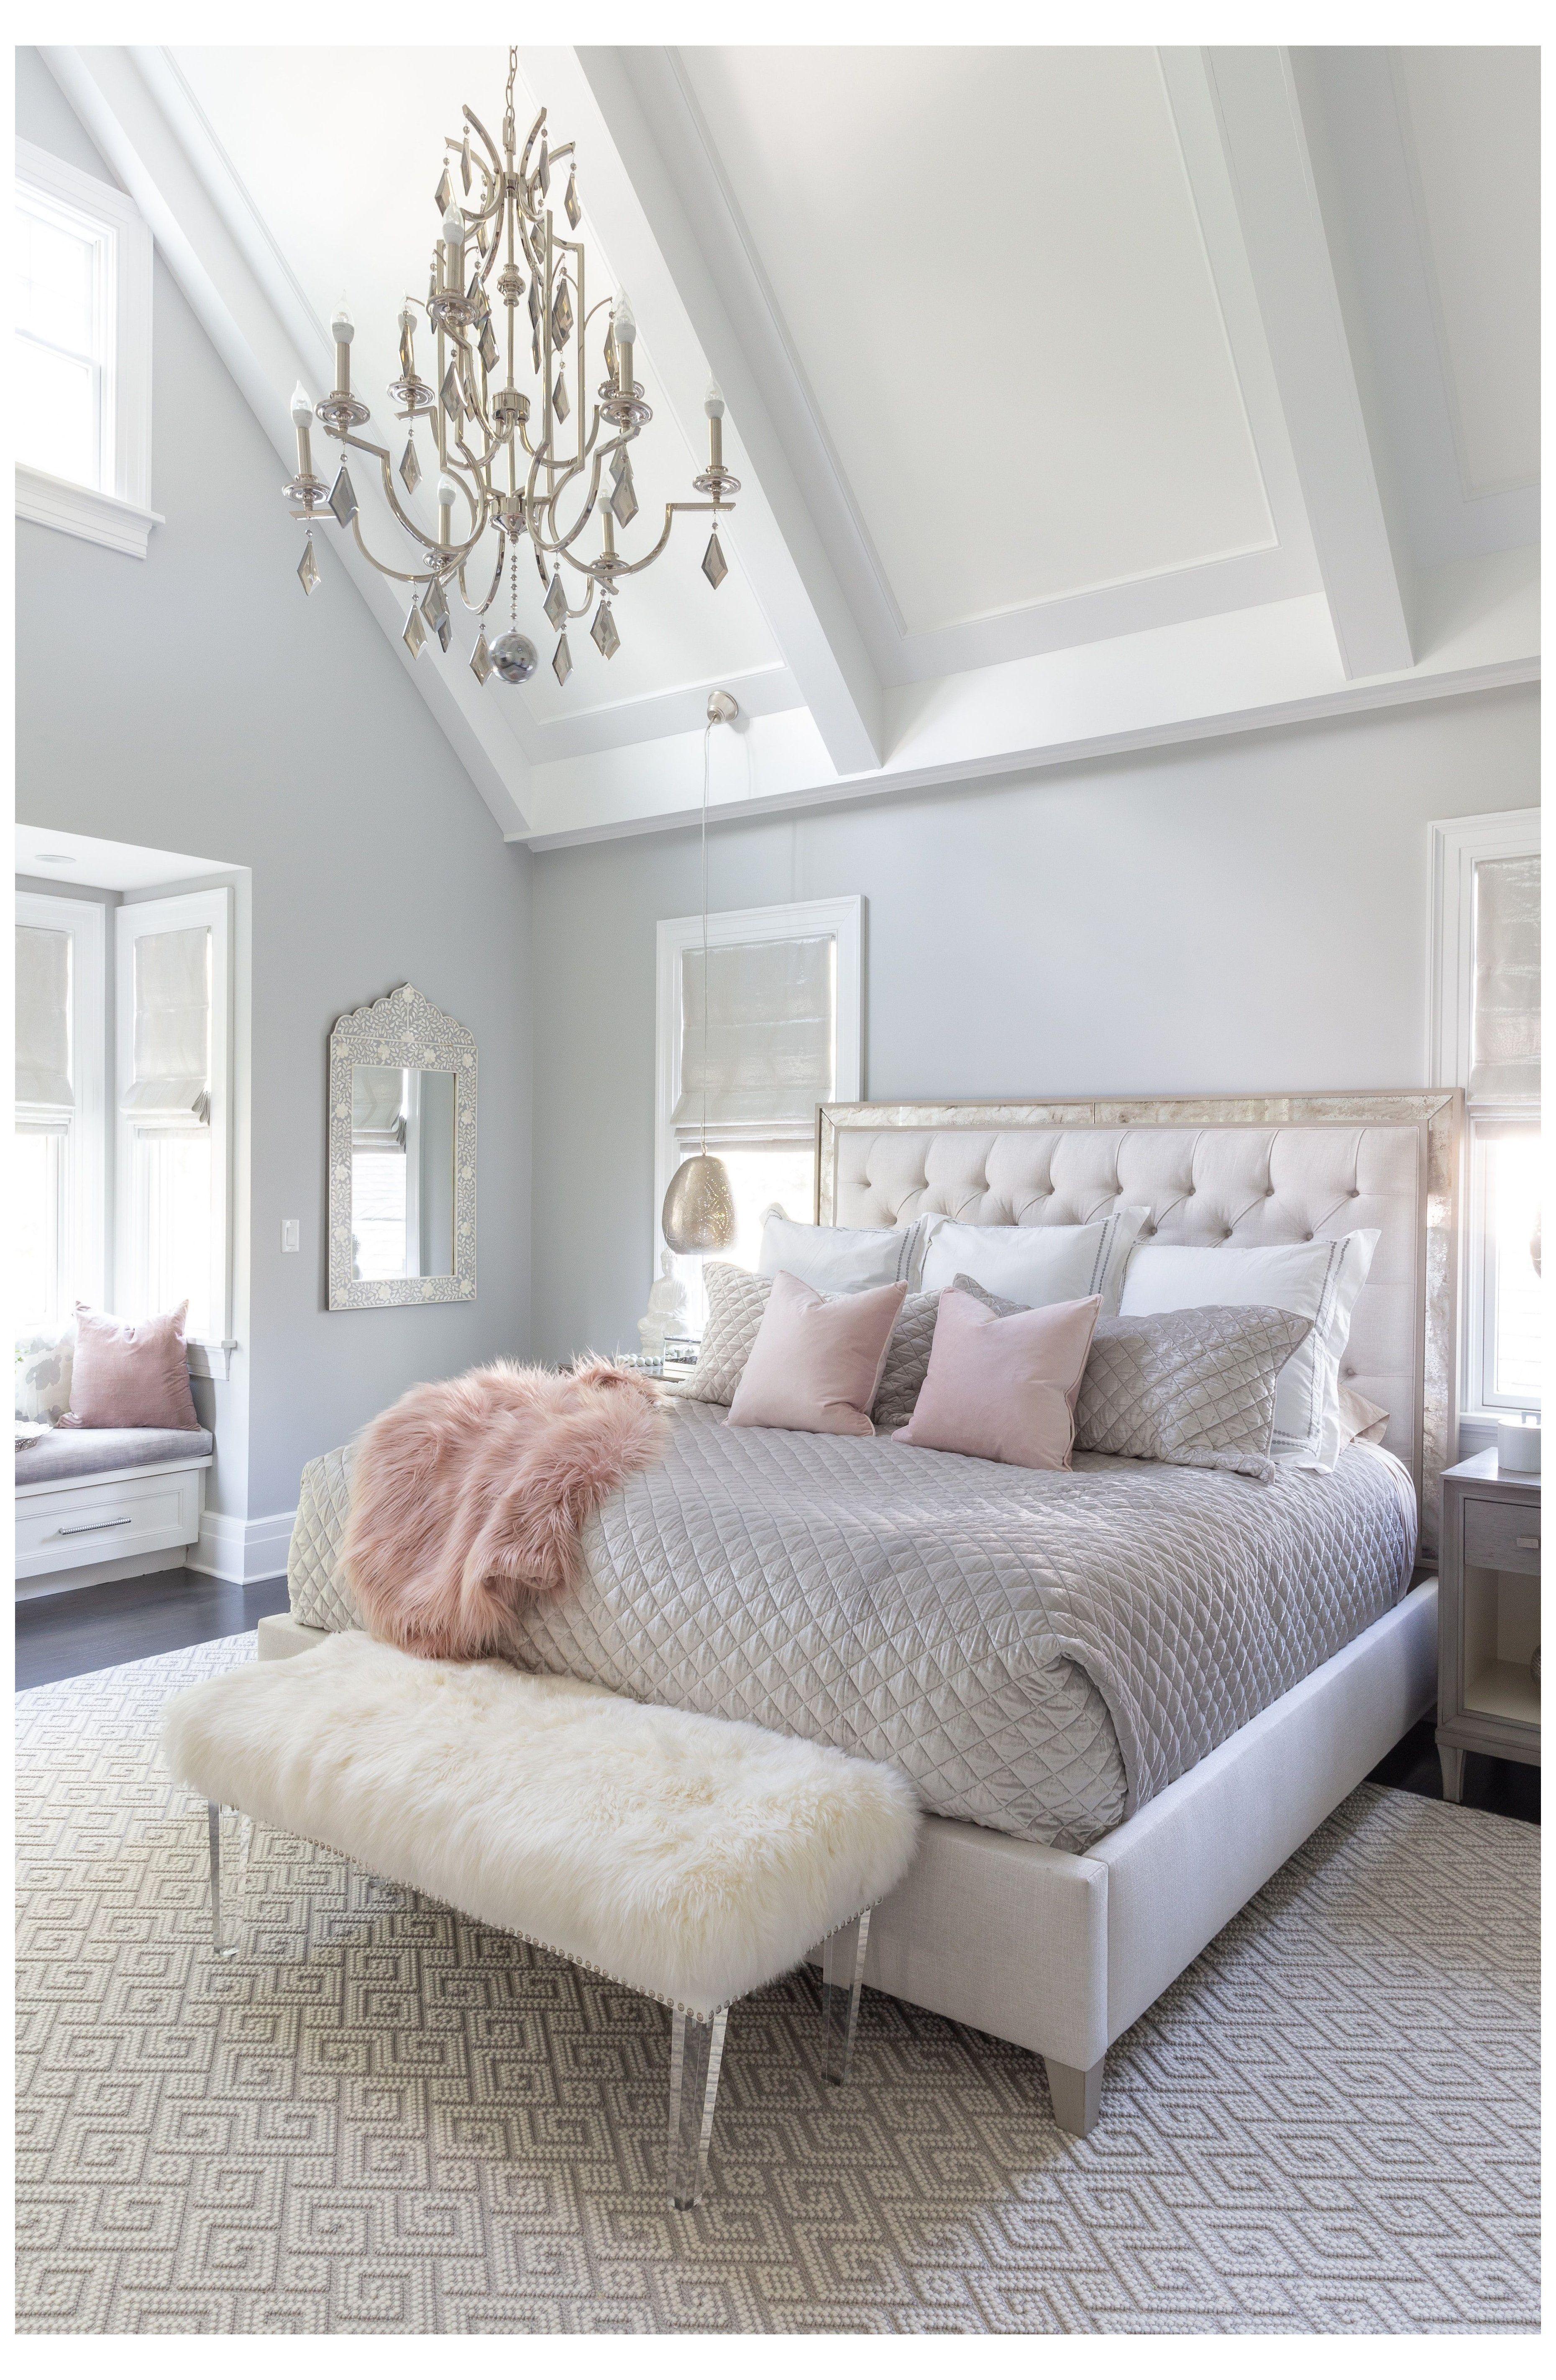 Master Bedroom Decor Romantic Romantic Master Bedroom In 2021 Interior Design Bedroom Small Luxurious Bedrooms Master Bedrooms Decor